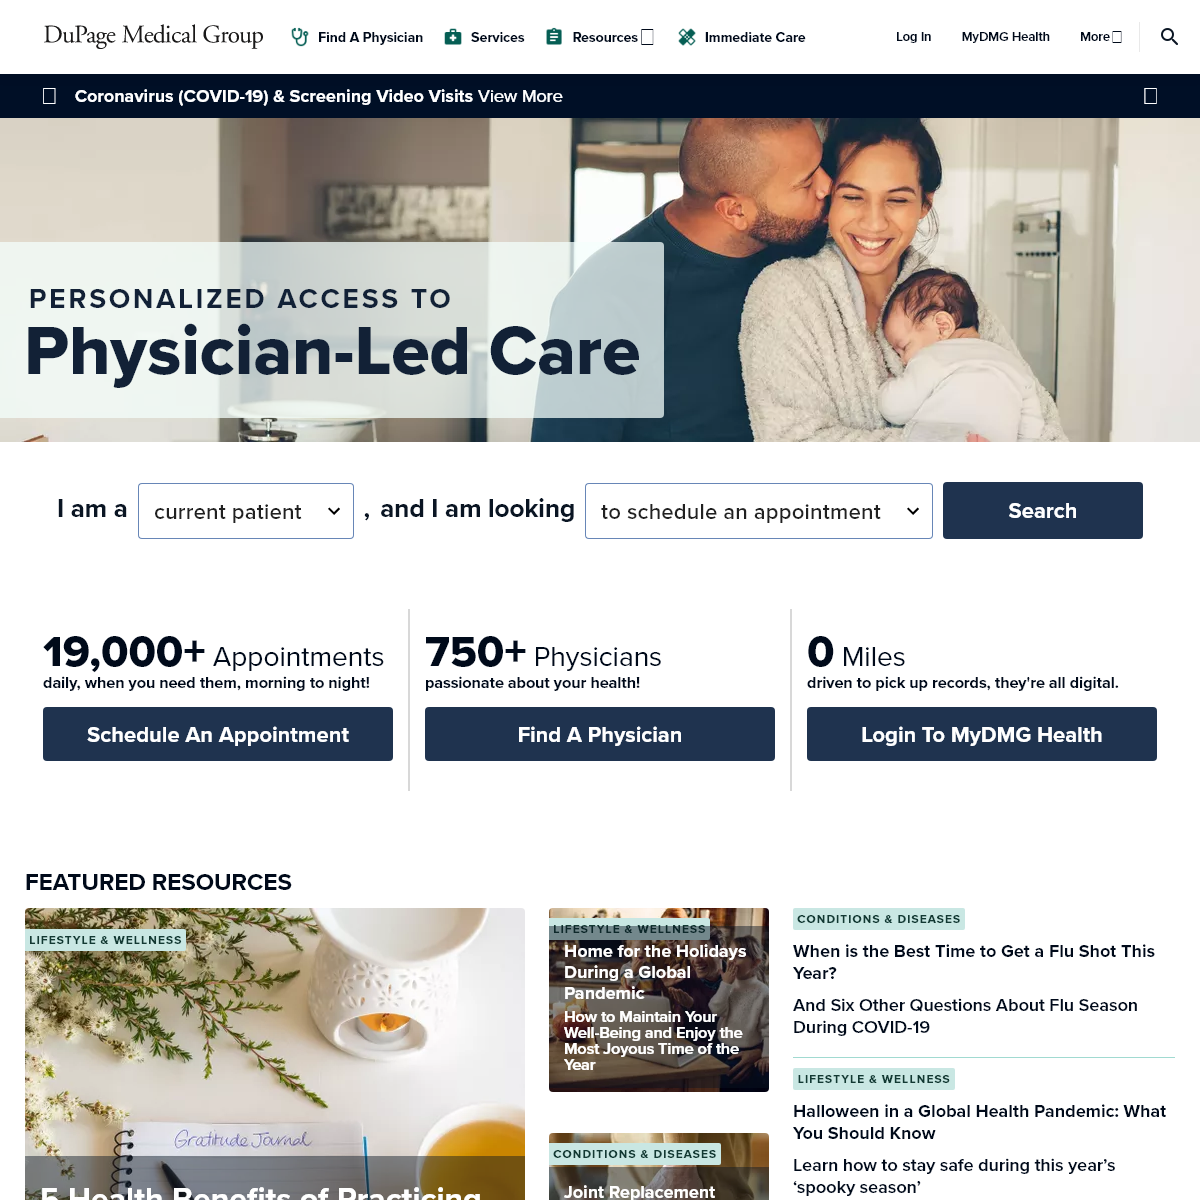 Home - DuPage Medical Group